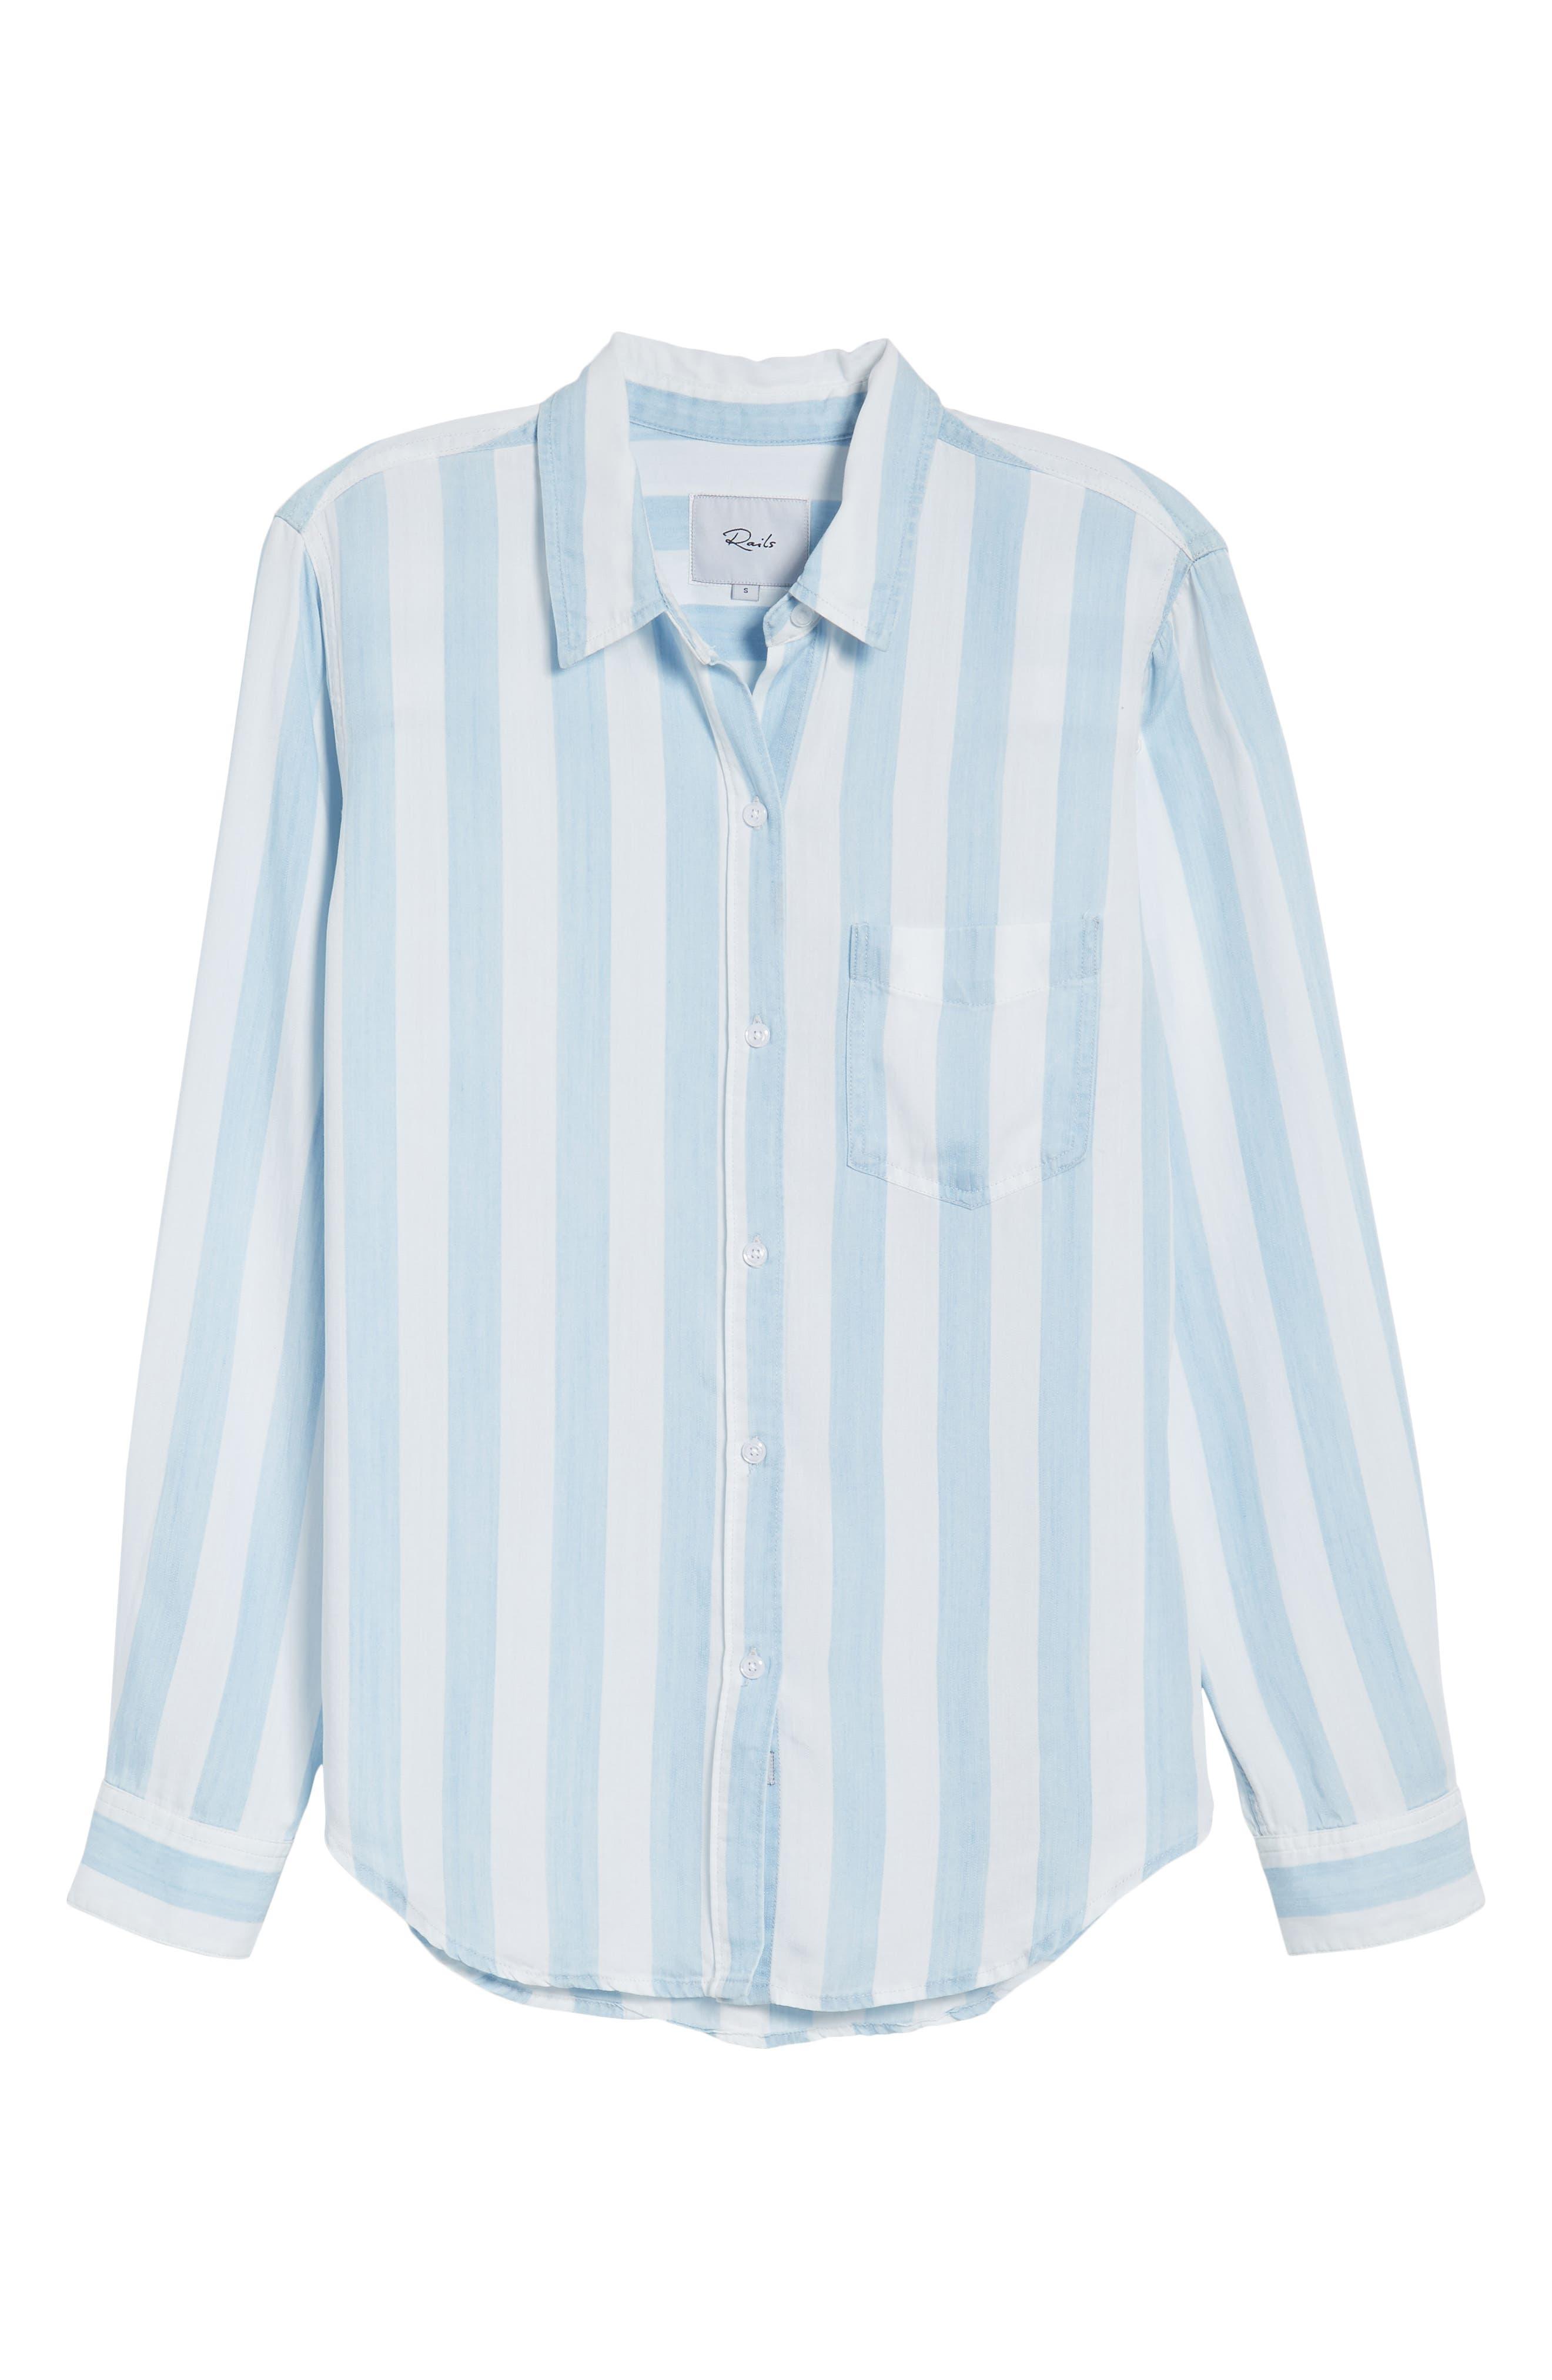 Ingrid Stripe Chambray Shirt,                             Alternate thumbnail 7, color,                             152